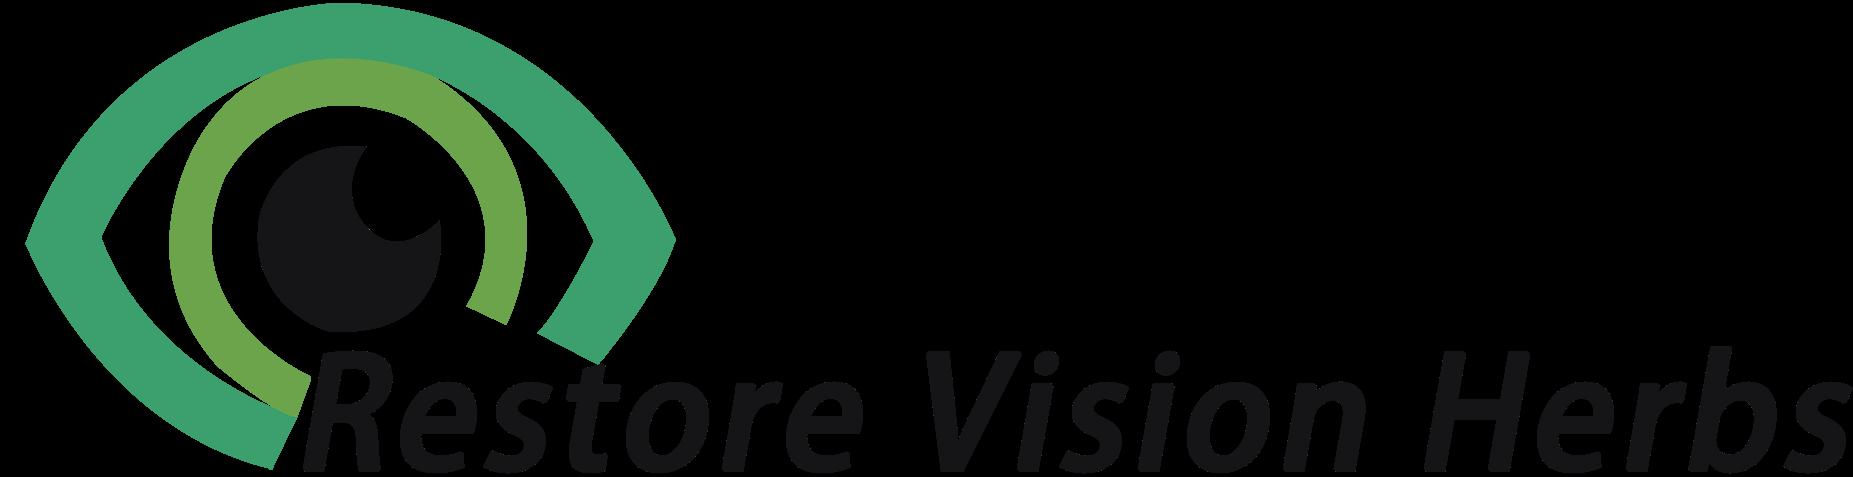 Restore Vision Herbs